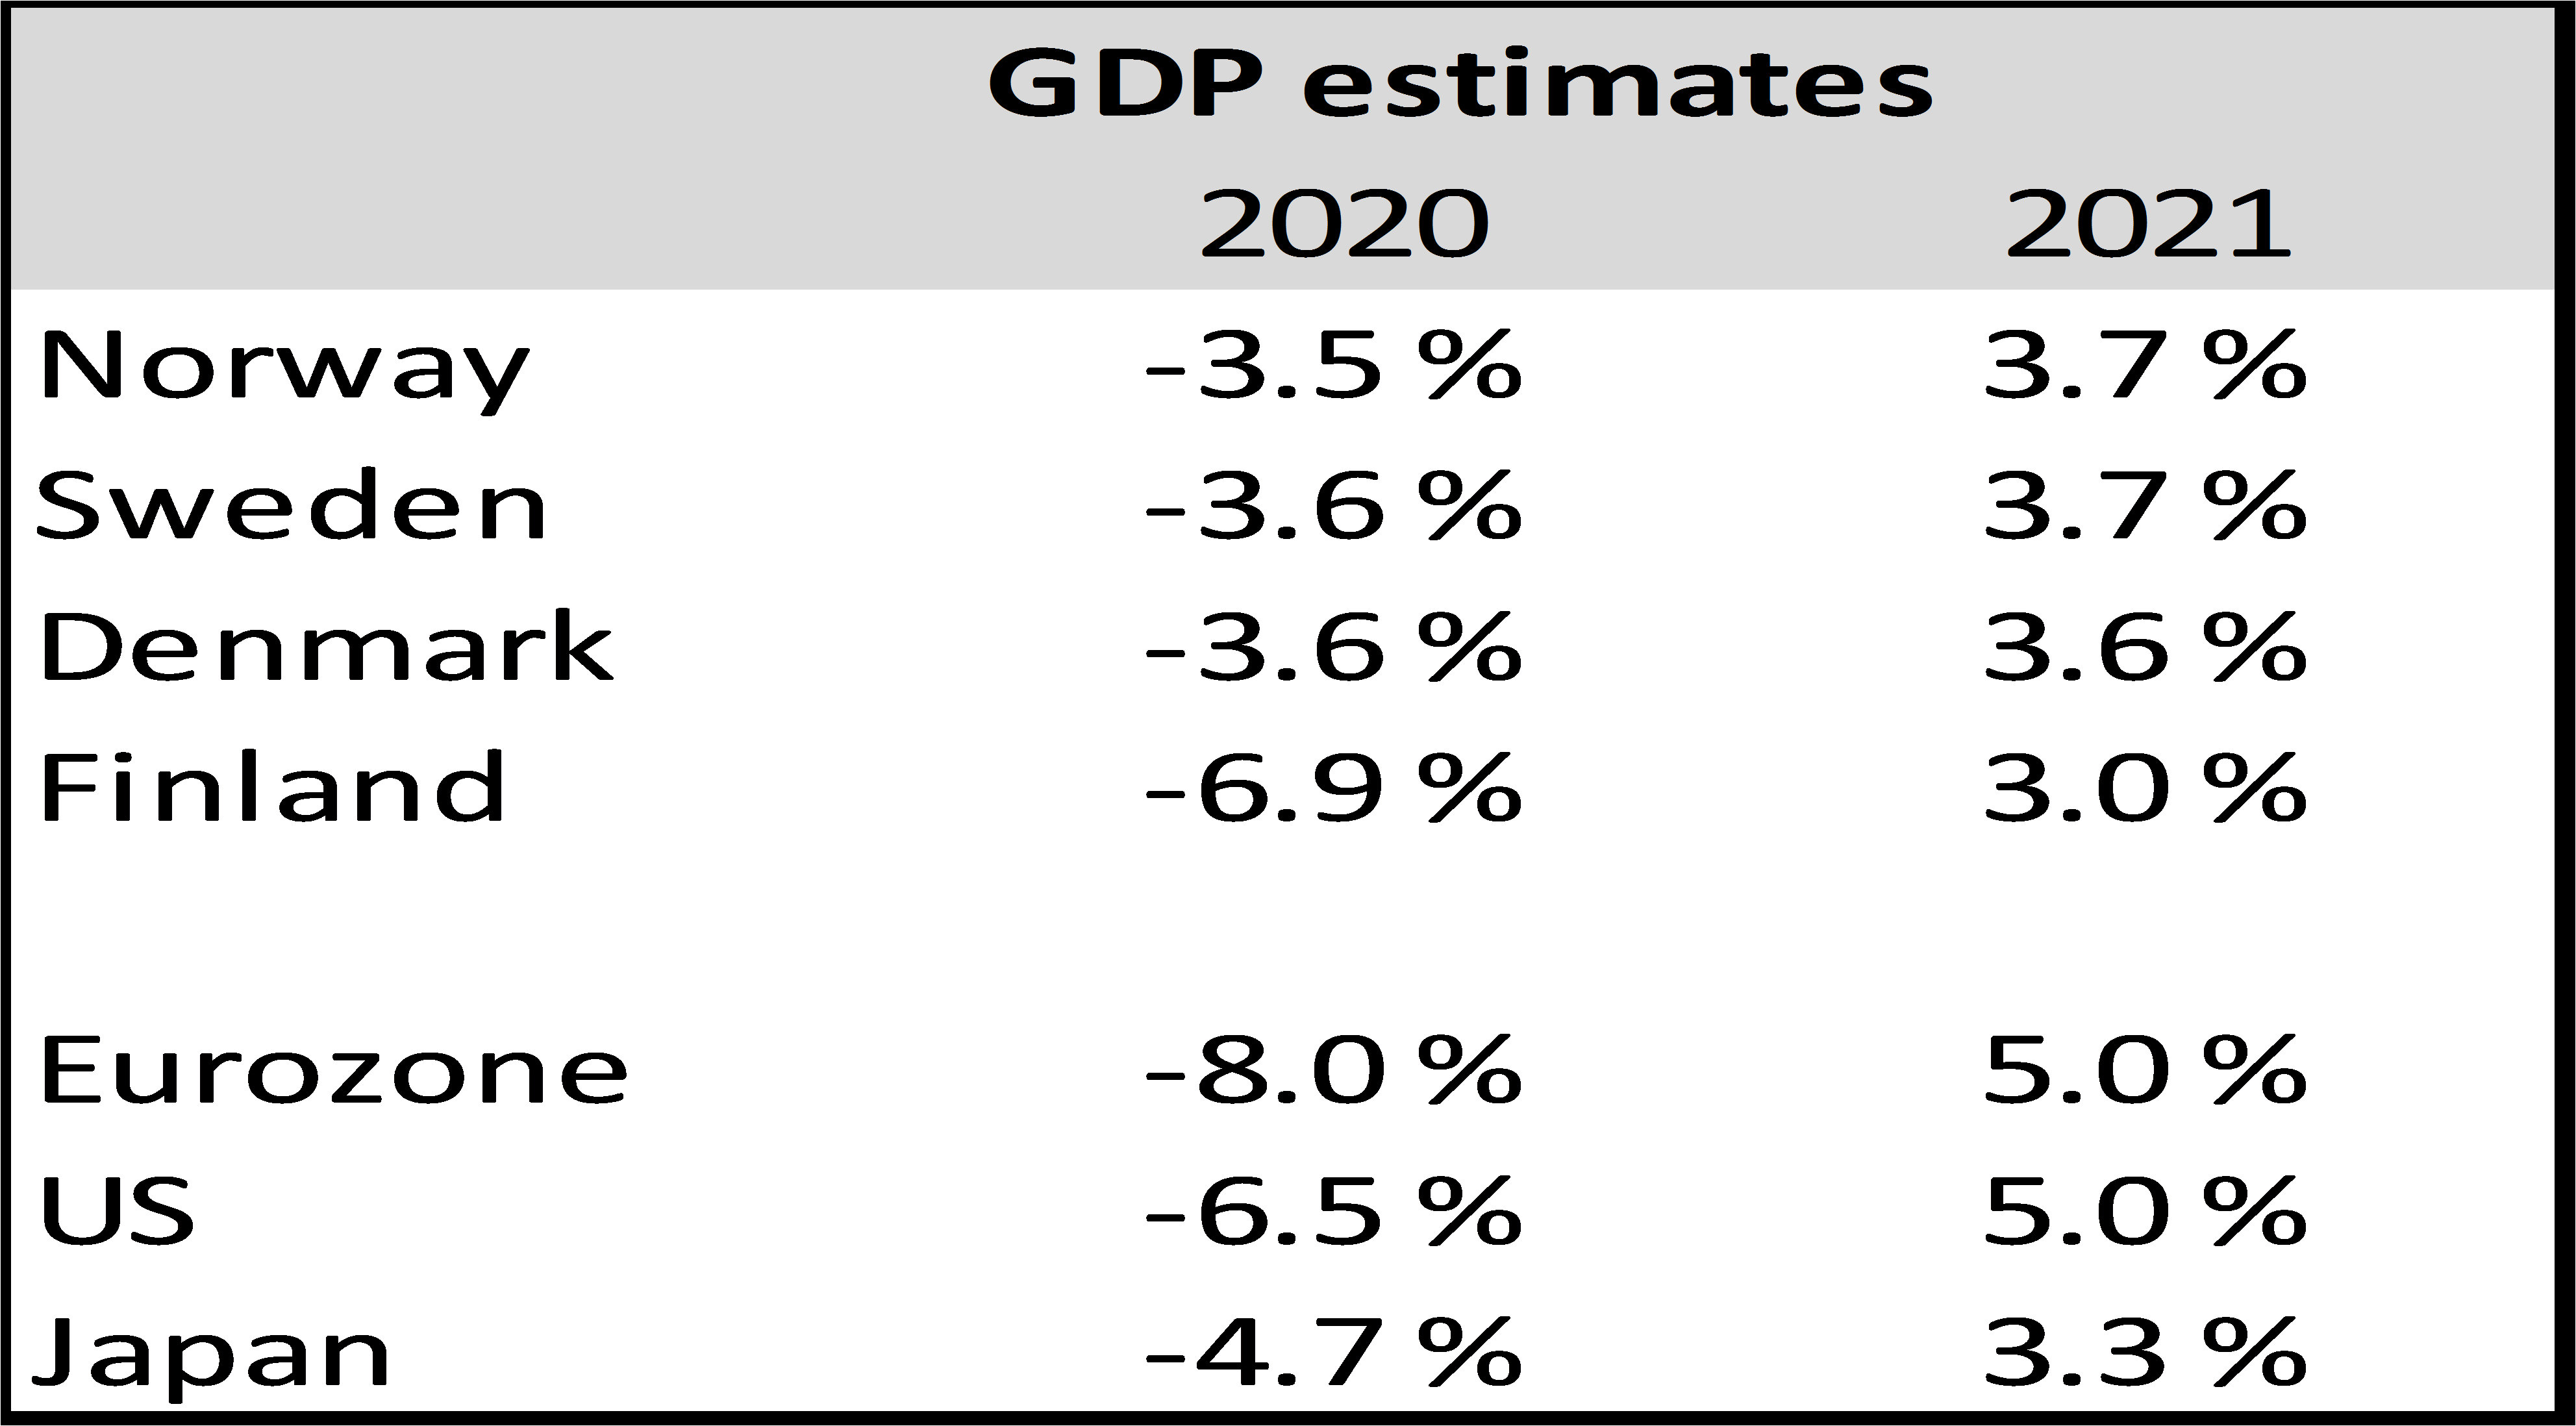 GDP Estimates